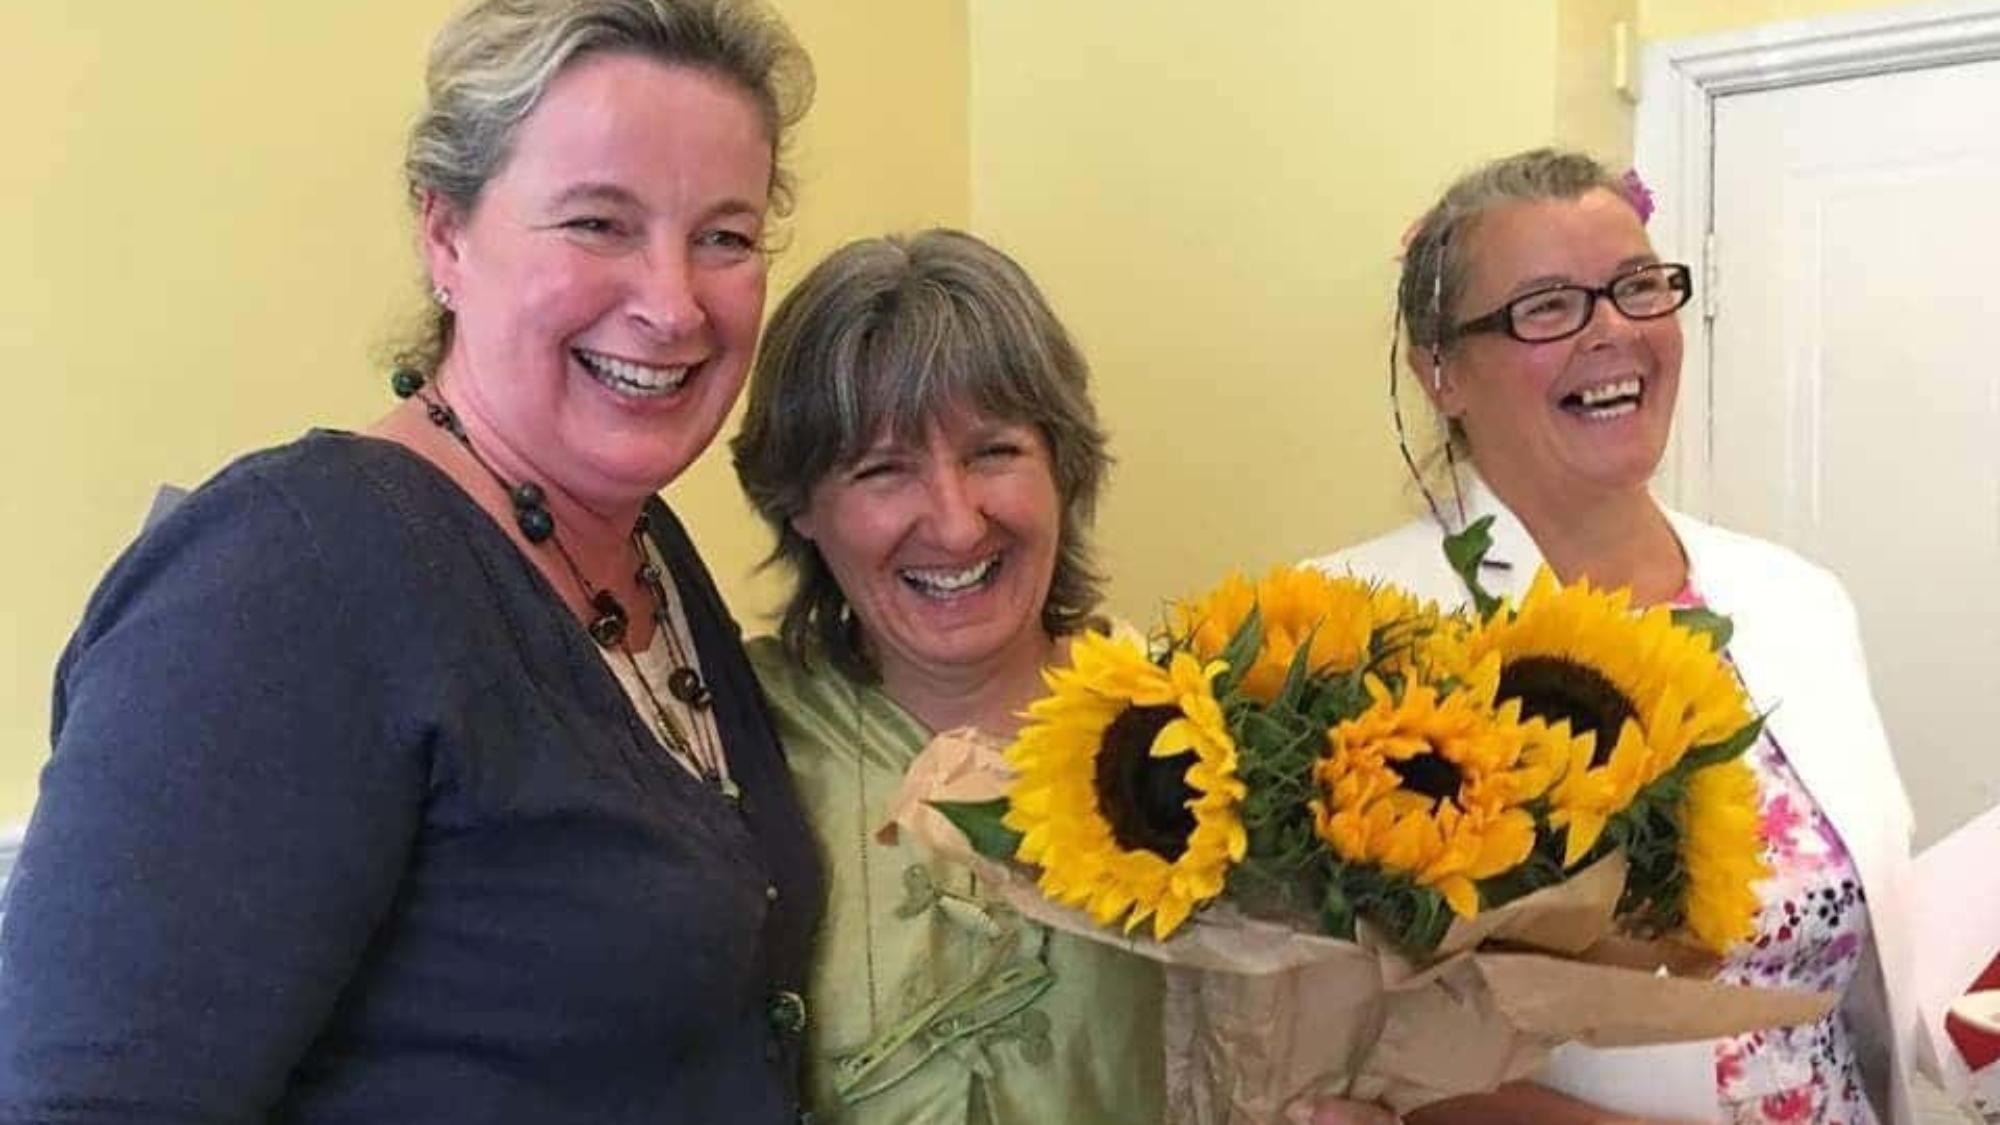 kate manders, GC2, graduation, growing club stories, bloom and grow